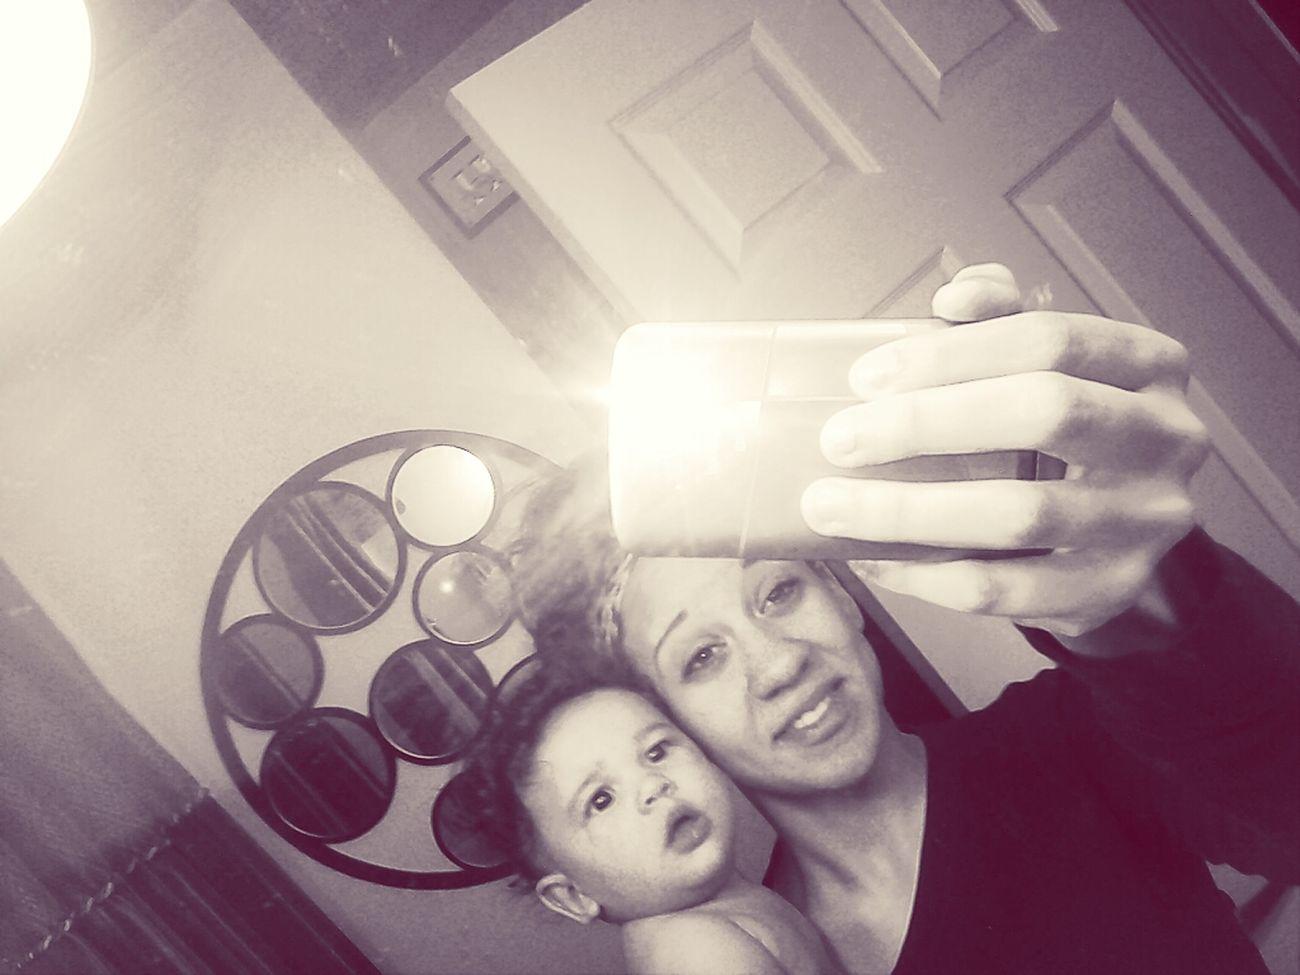 me&my love:)